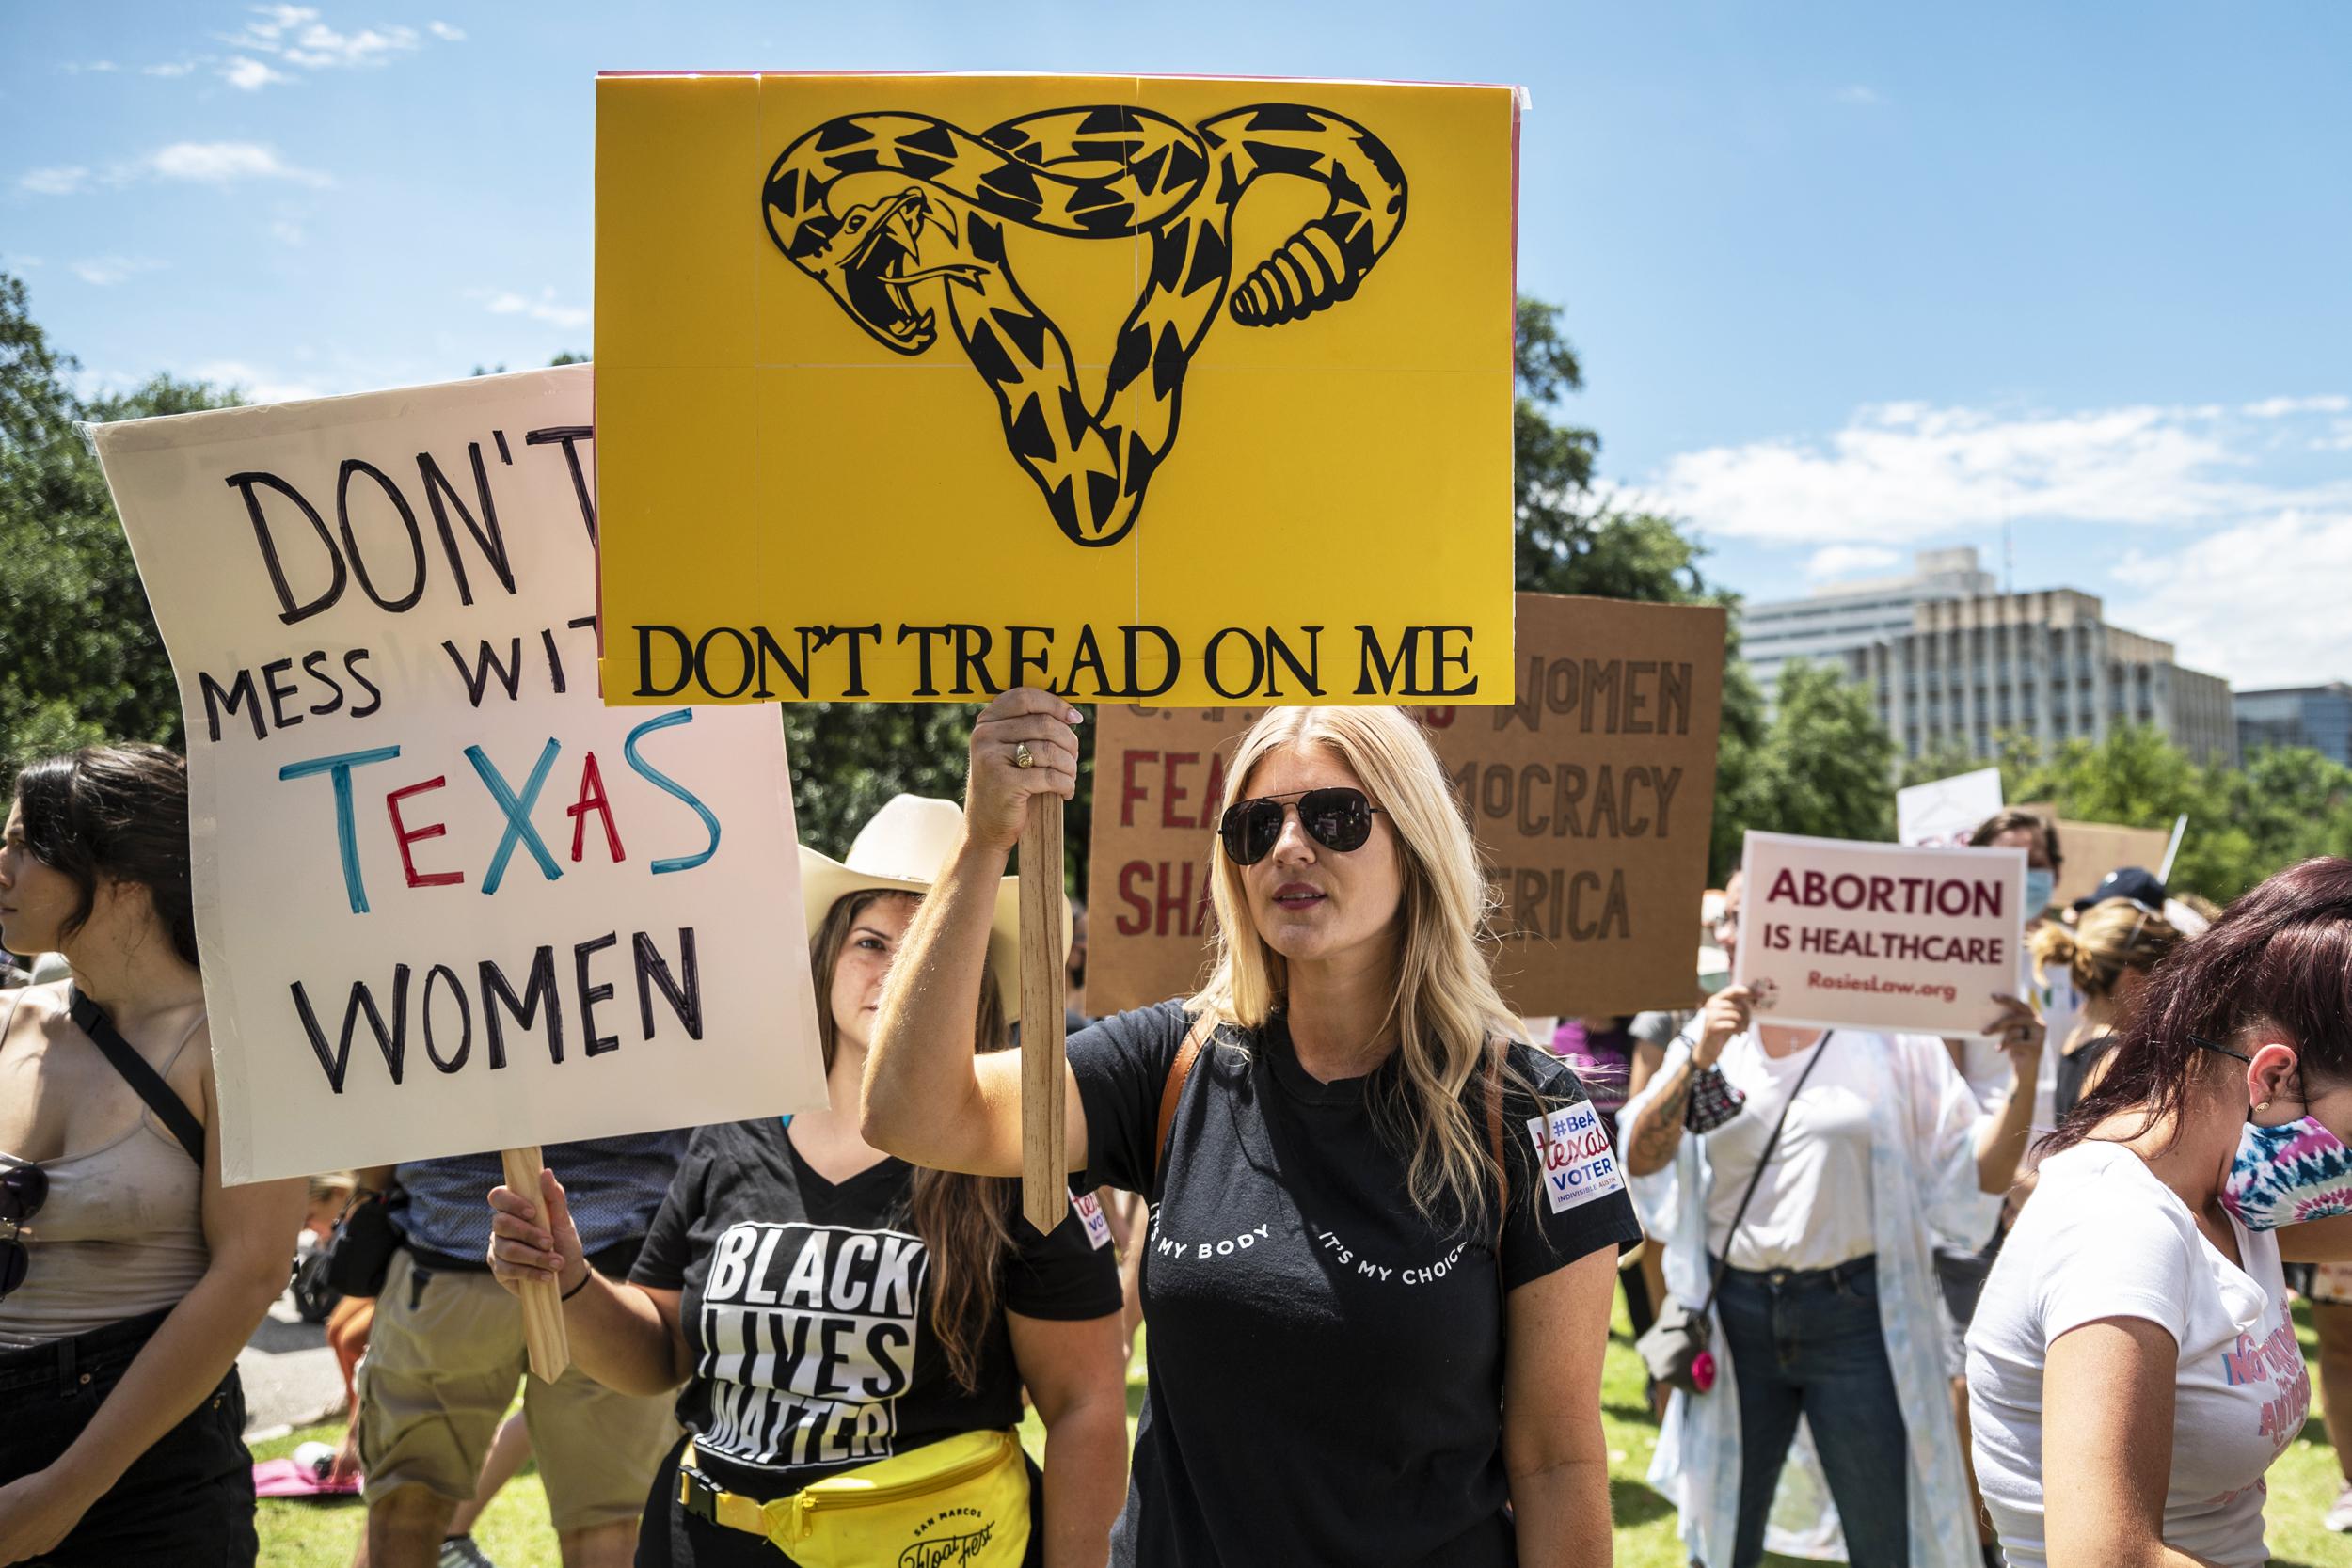 'Insidious,' 'draconian,' 'cruel': New Texas abortion law empowers vigilantism, experts say